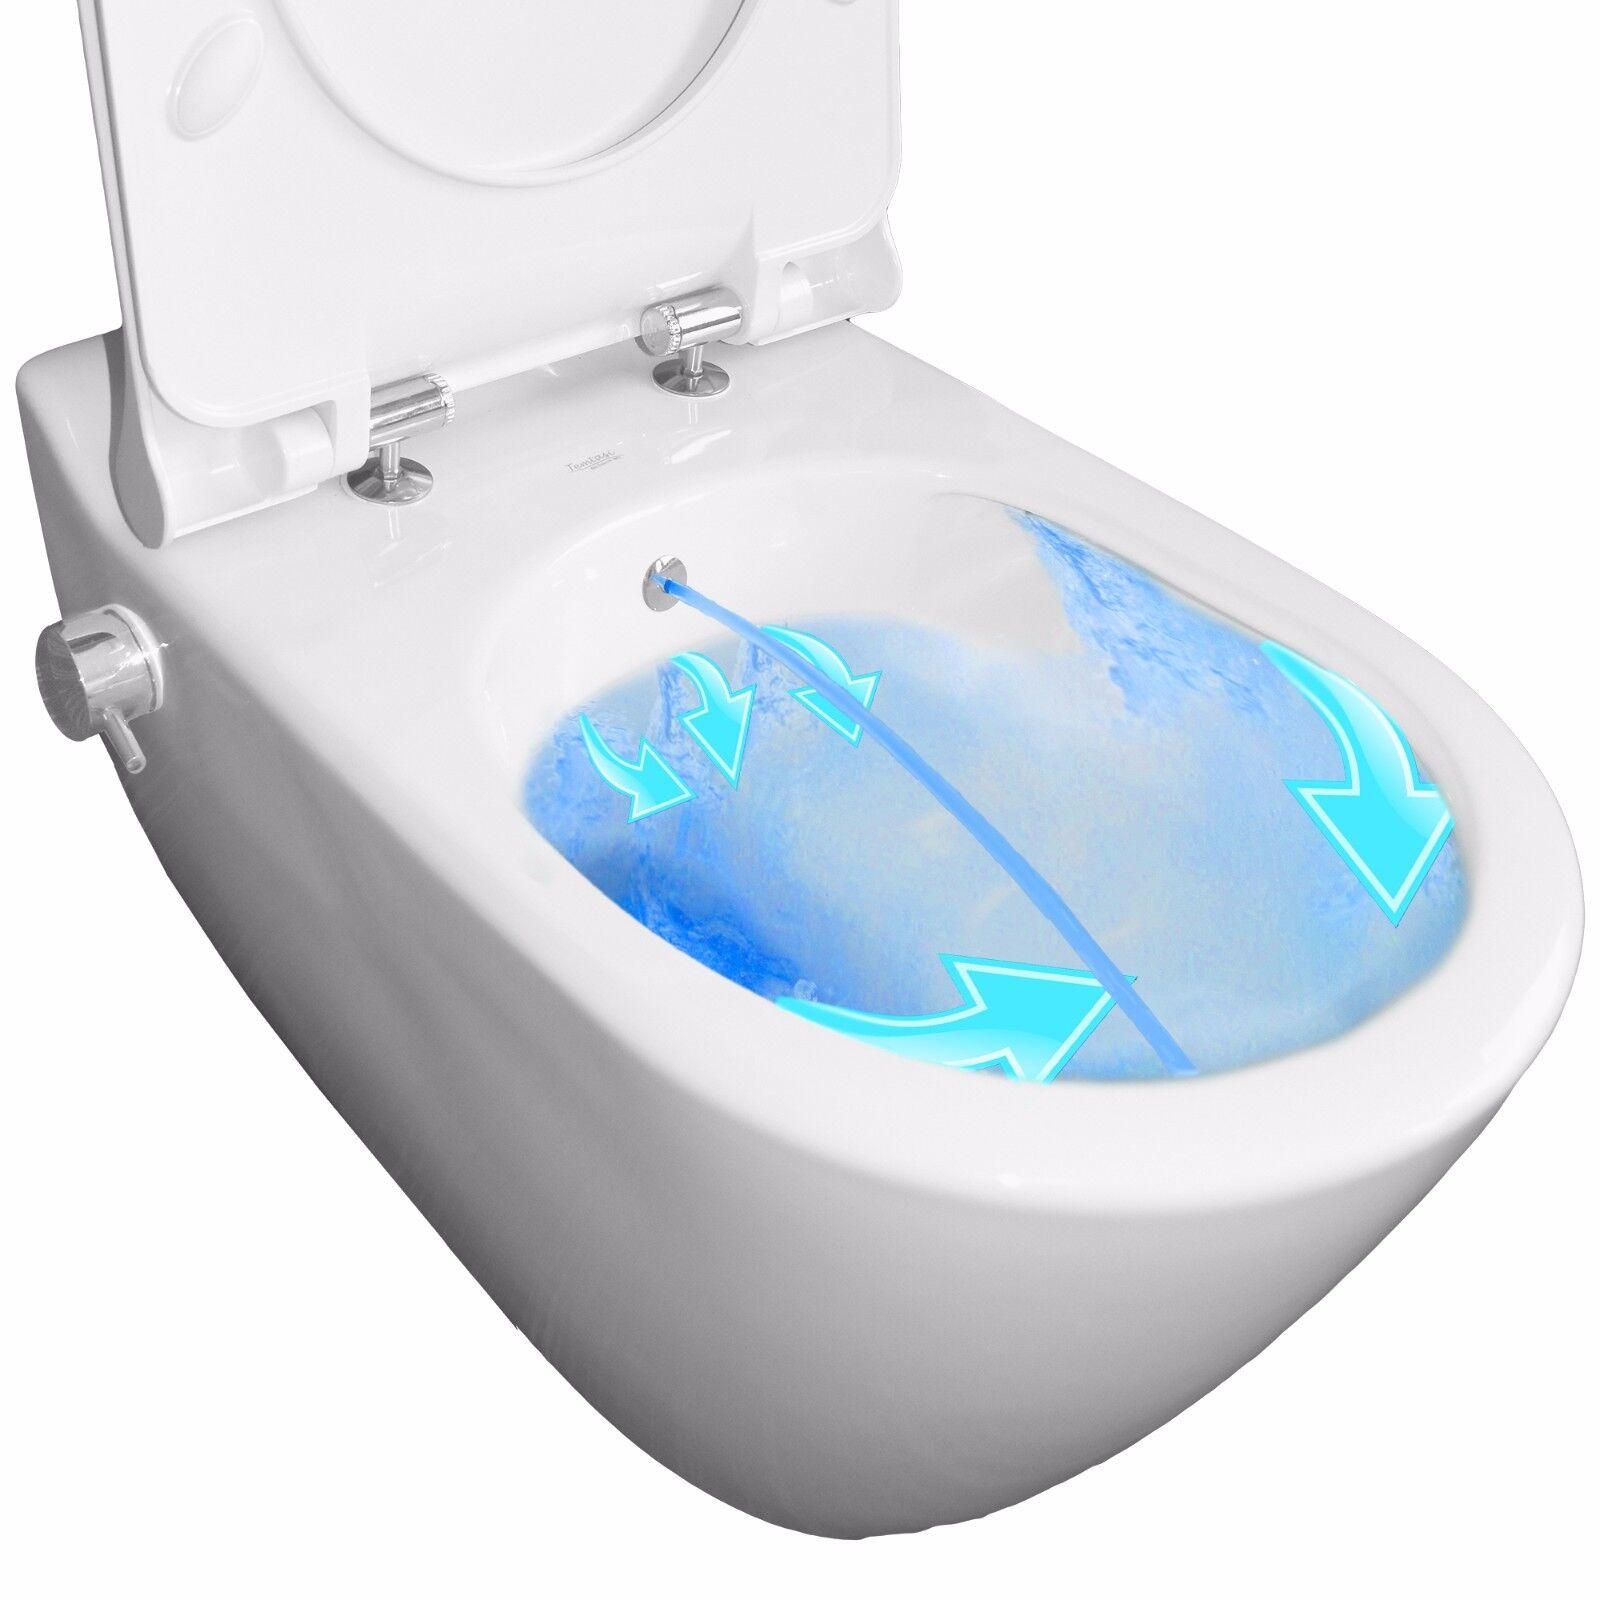 Dusch WC spülrandlos Mineral Bidet no rim less Taharet Toilette Klo Taharat M1